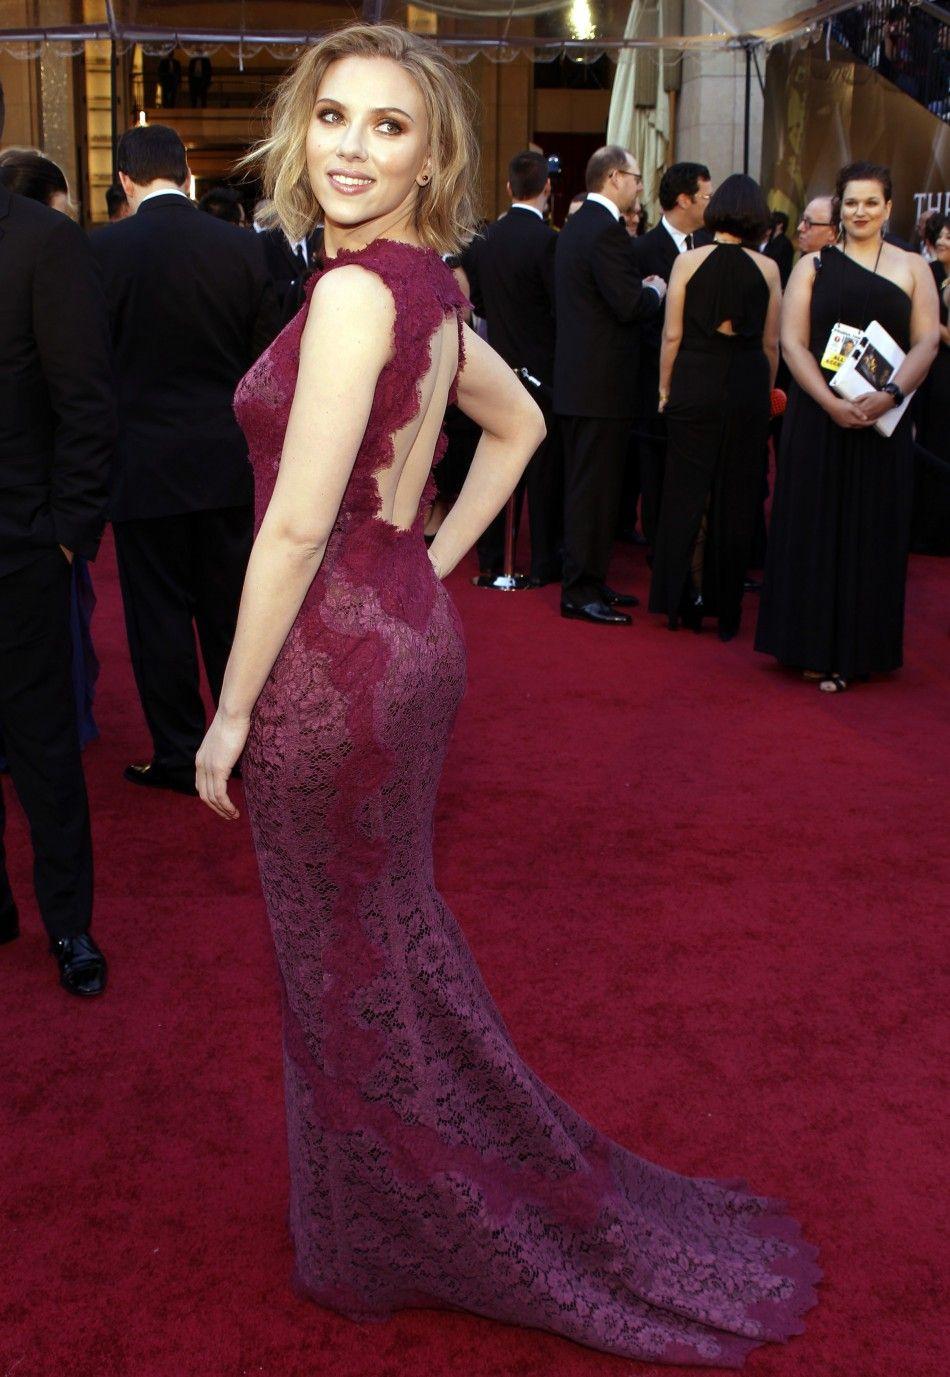 Scarlett Johansson Oscars  2011 in 2020 Scarlett johansson 950x1377